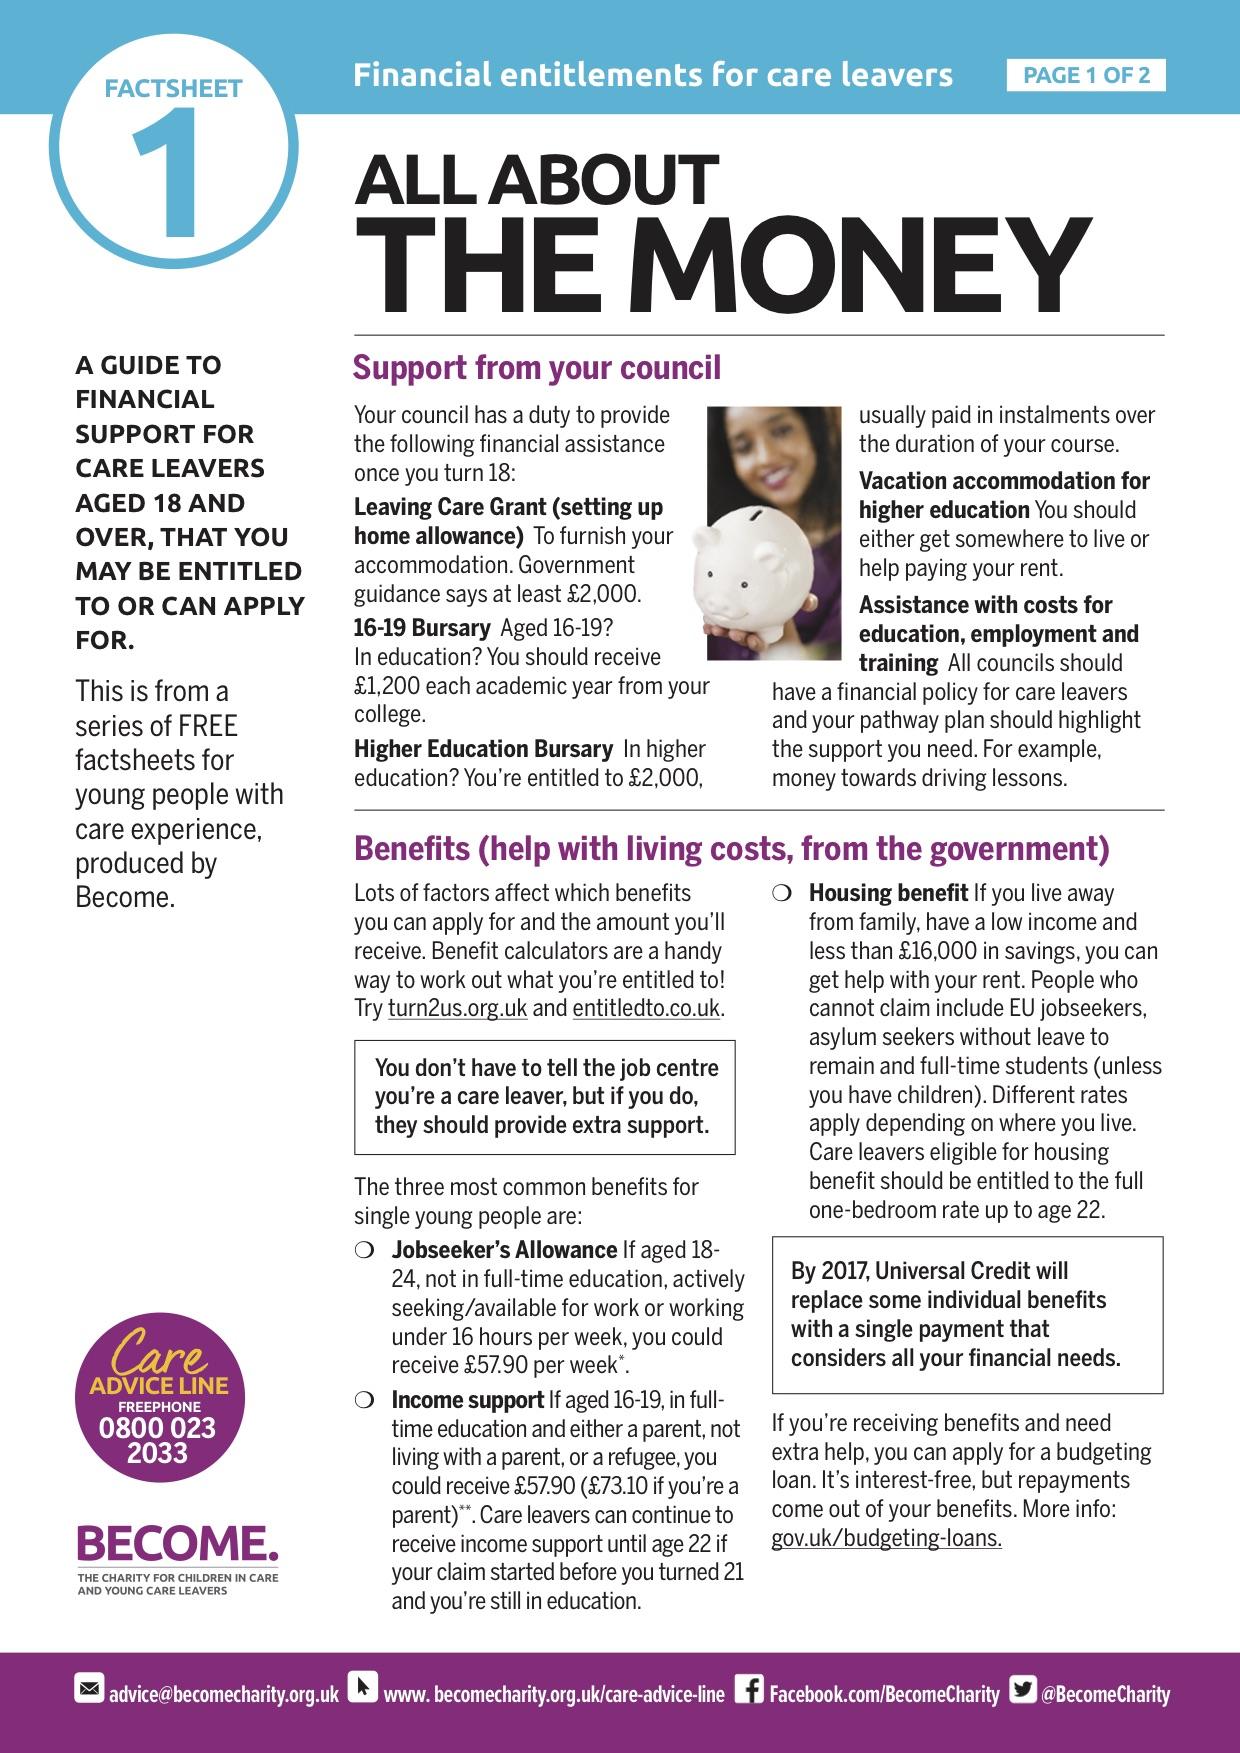 factsheet1_financial_entitlements_english.jpg